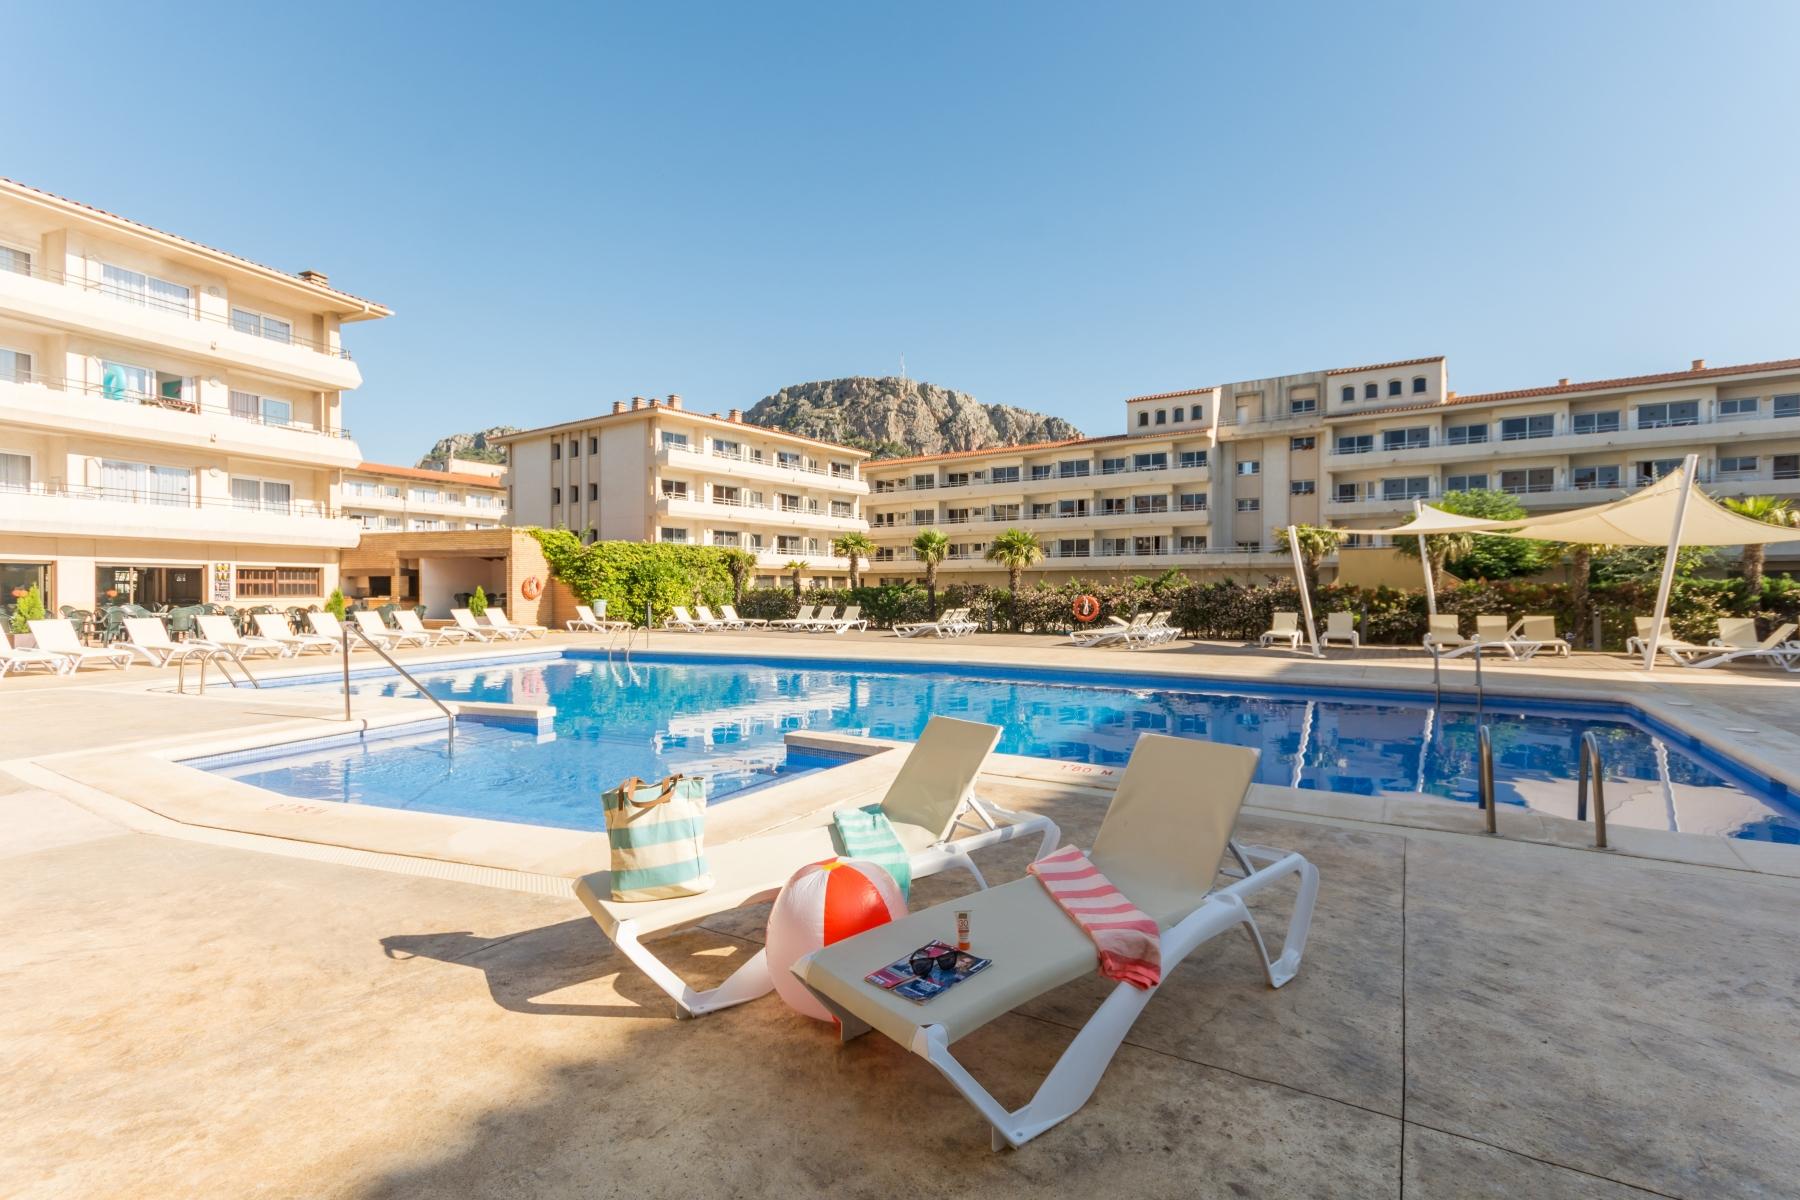 Vakantiedeal vakantiehuisje Girona 🏕️Pierre & Vacances Résidence Estartit Playa